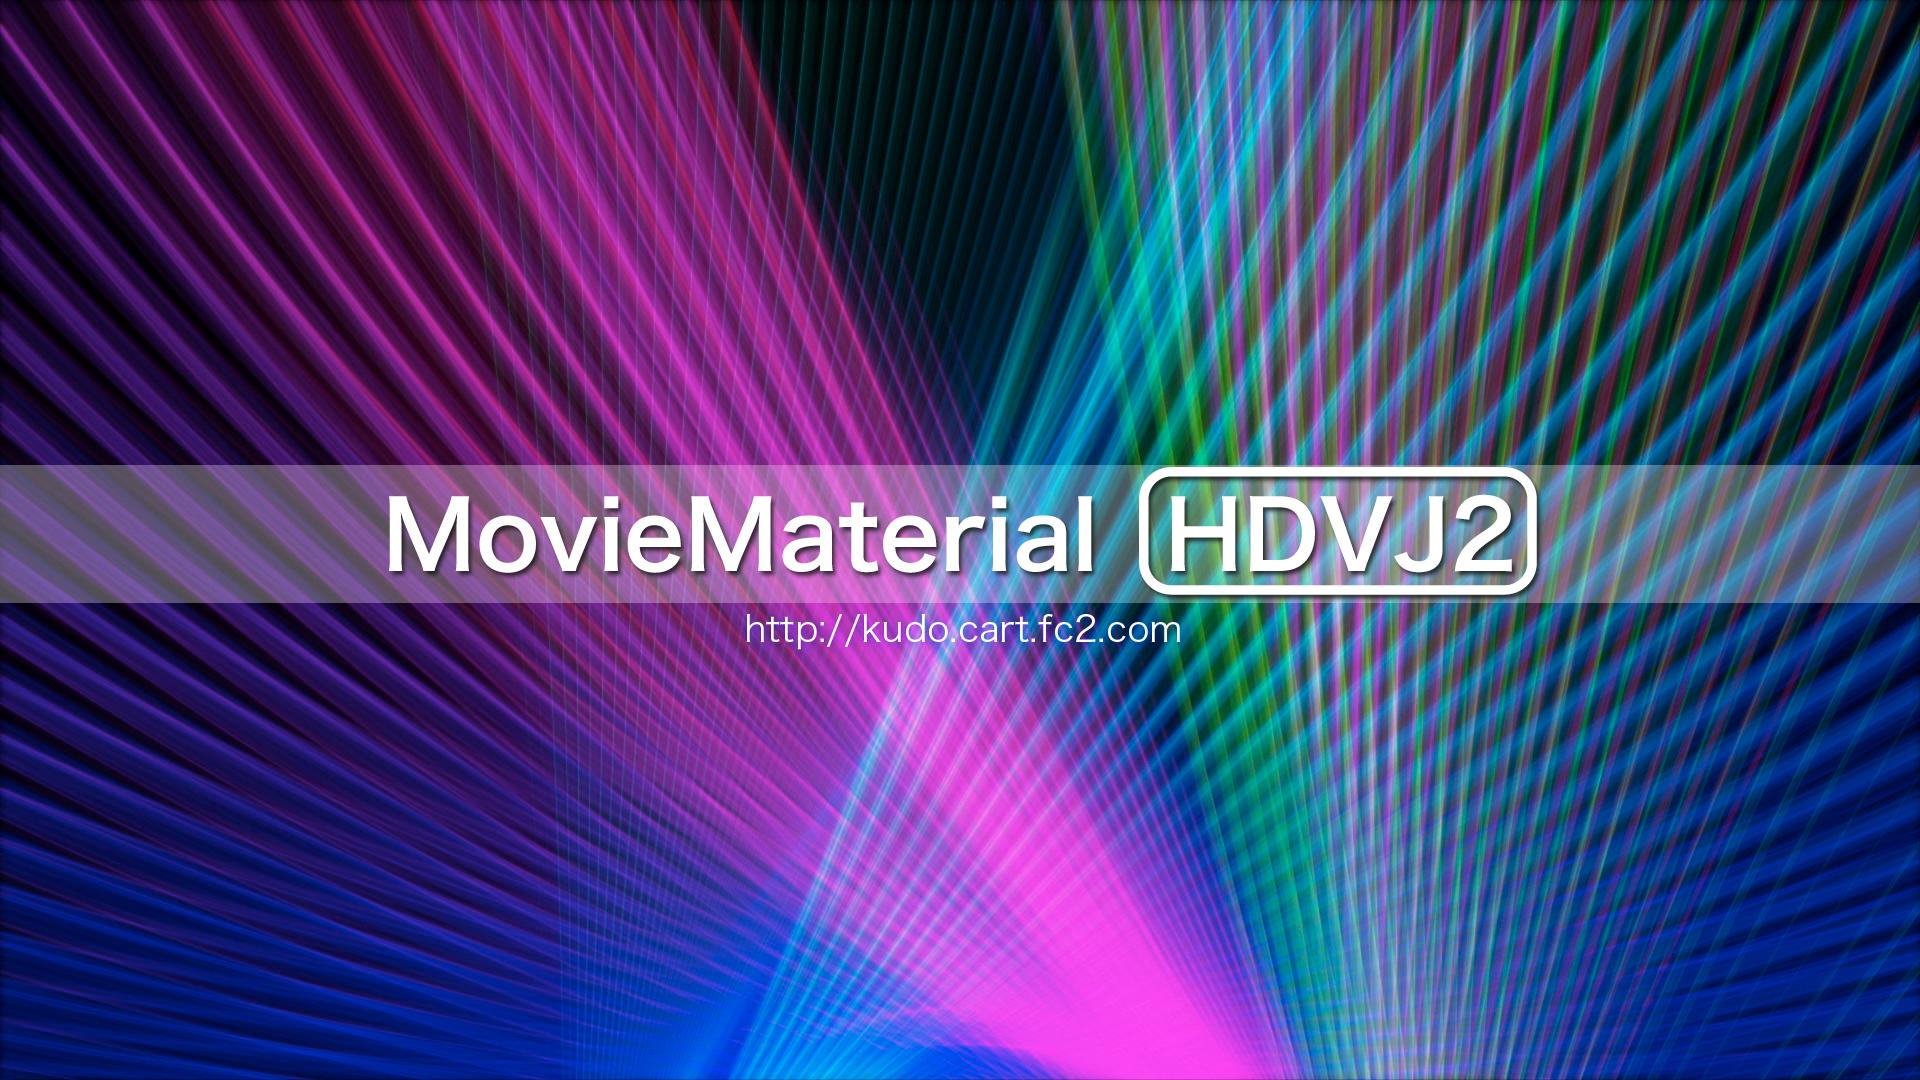 MovieMaterial HDVJ2 フルハイビジョンVJ動画素材集 画像1